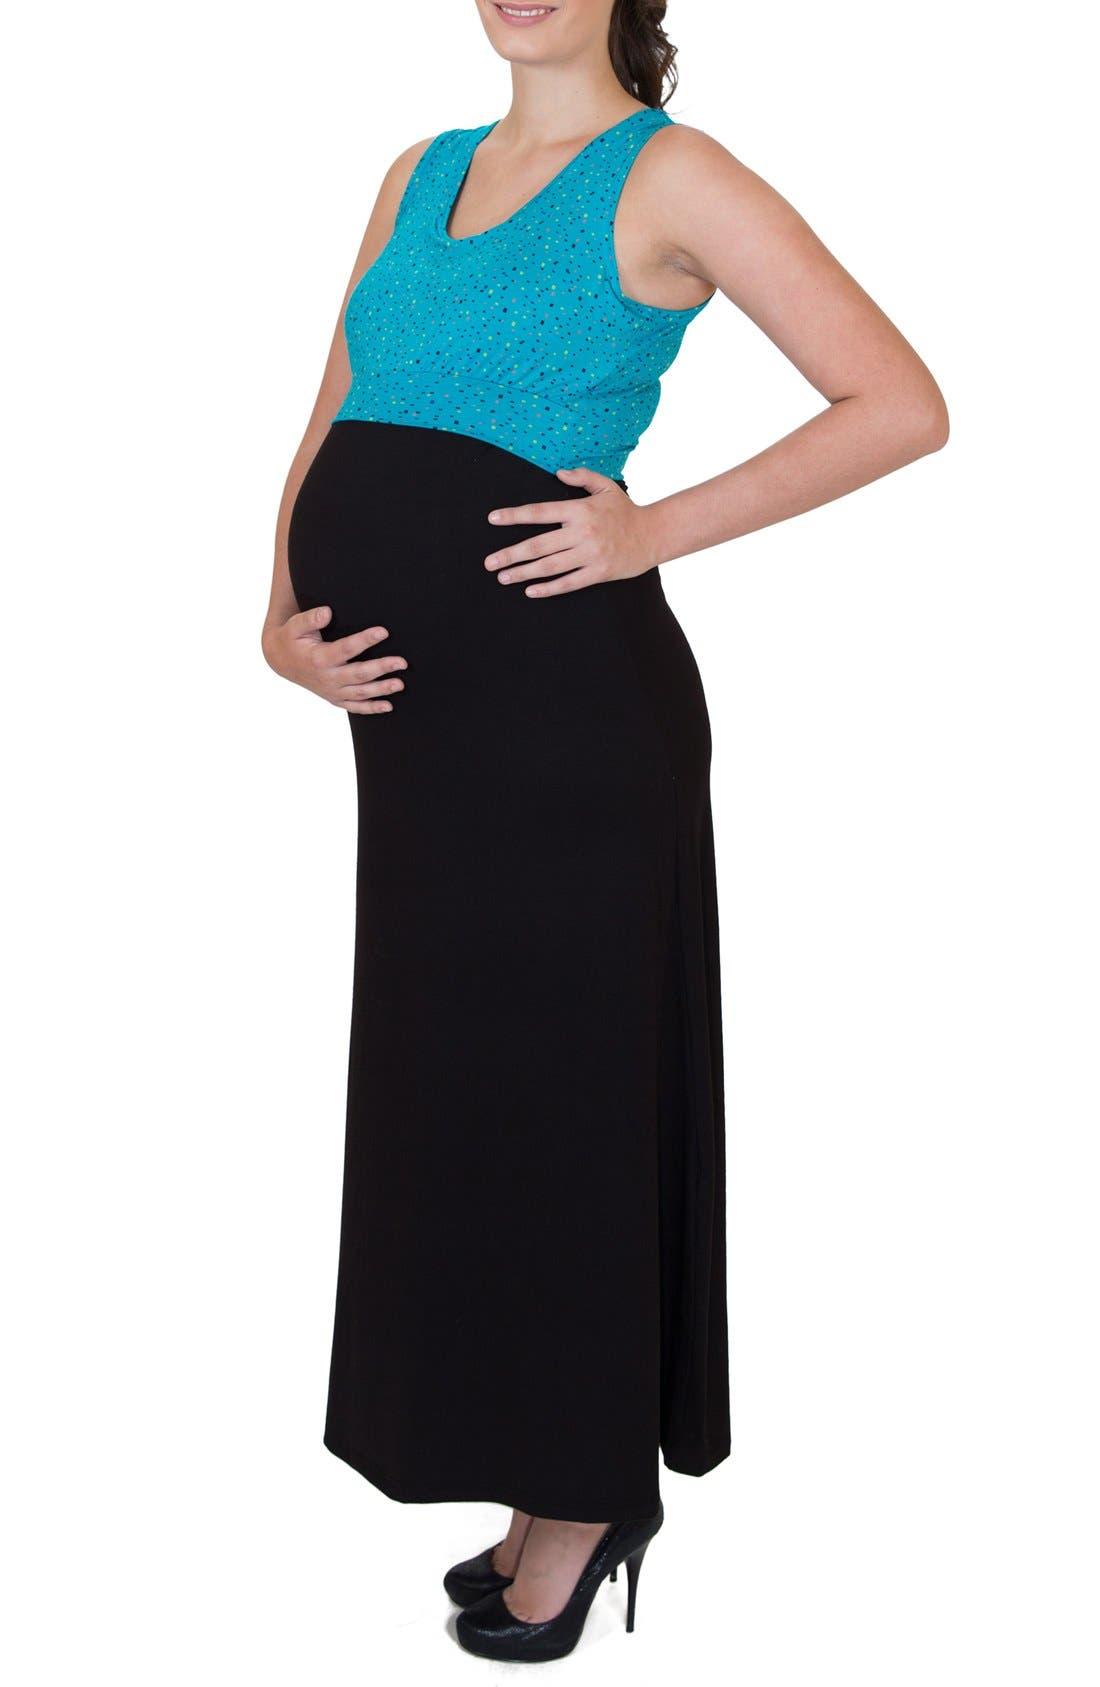 'Mariana' Maternity/Nursing Maxi Dress,                             Alternate thumbnail 3, color,                             DOTS TOP W/ BLACK SKIRT